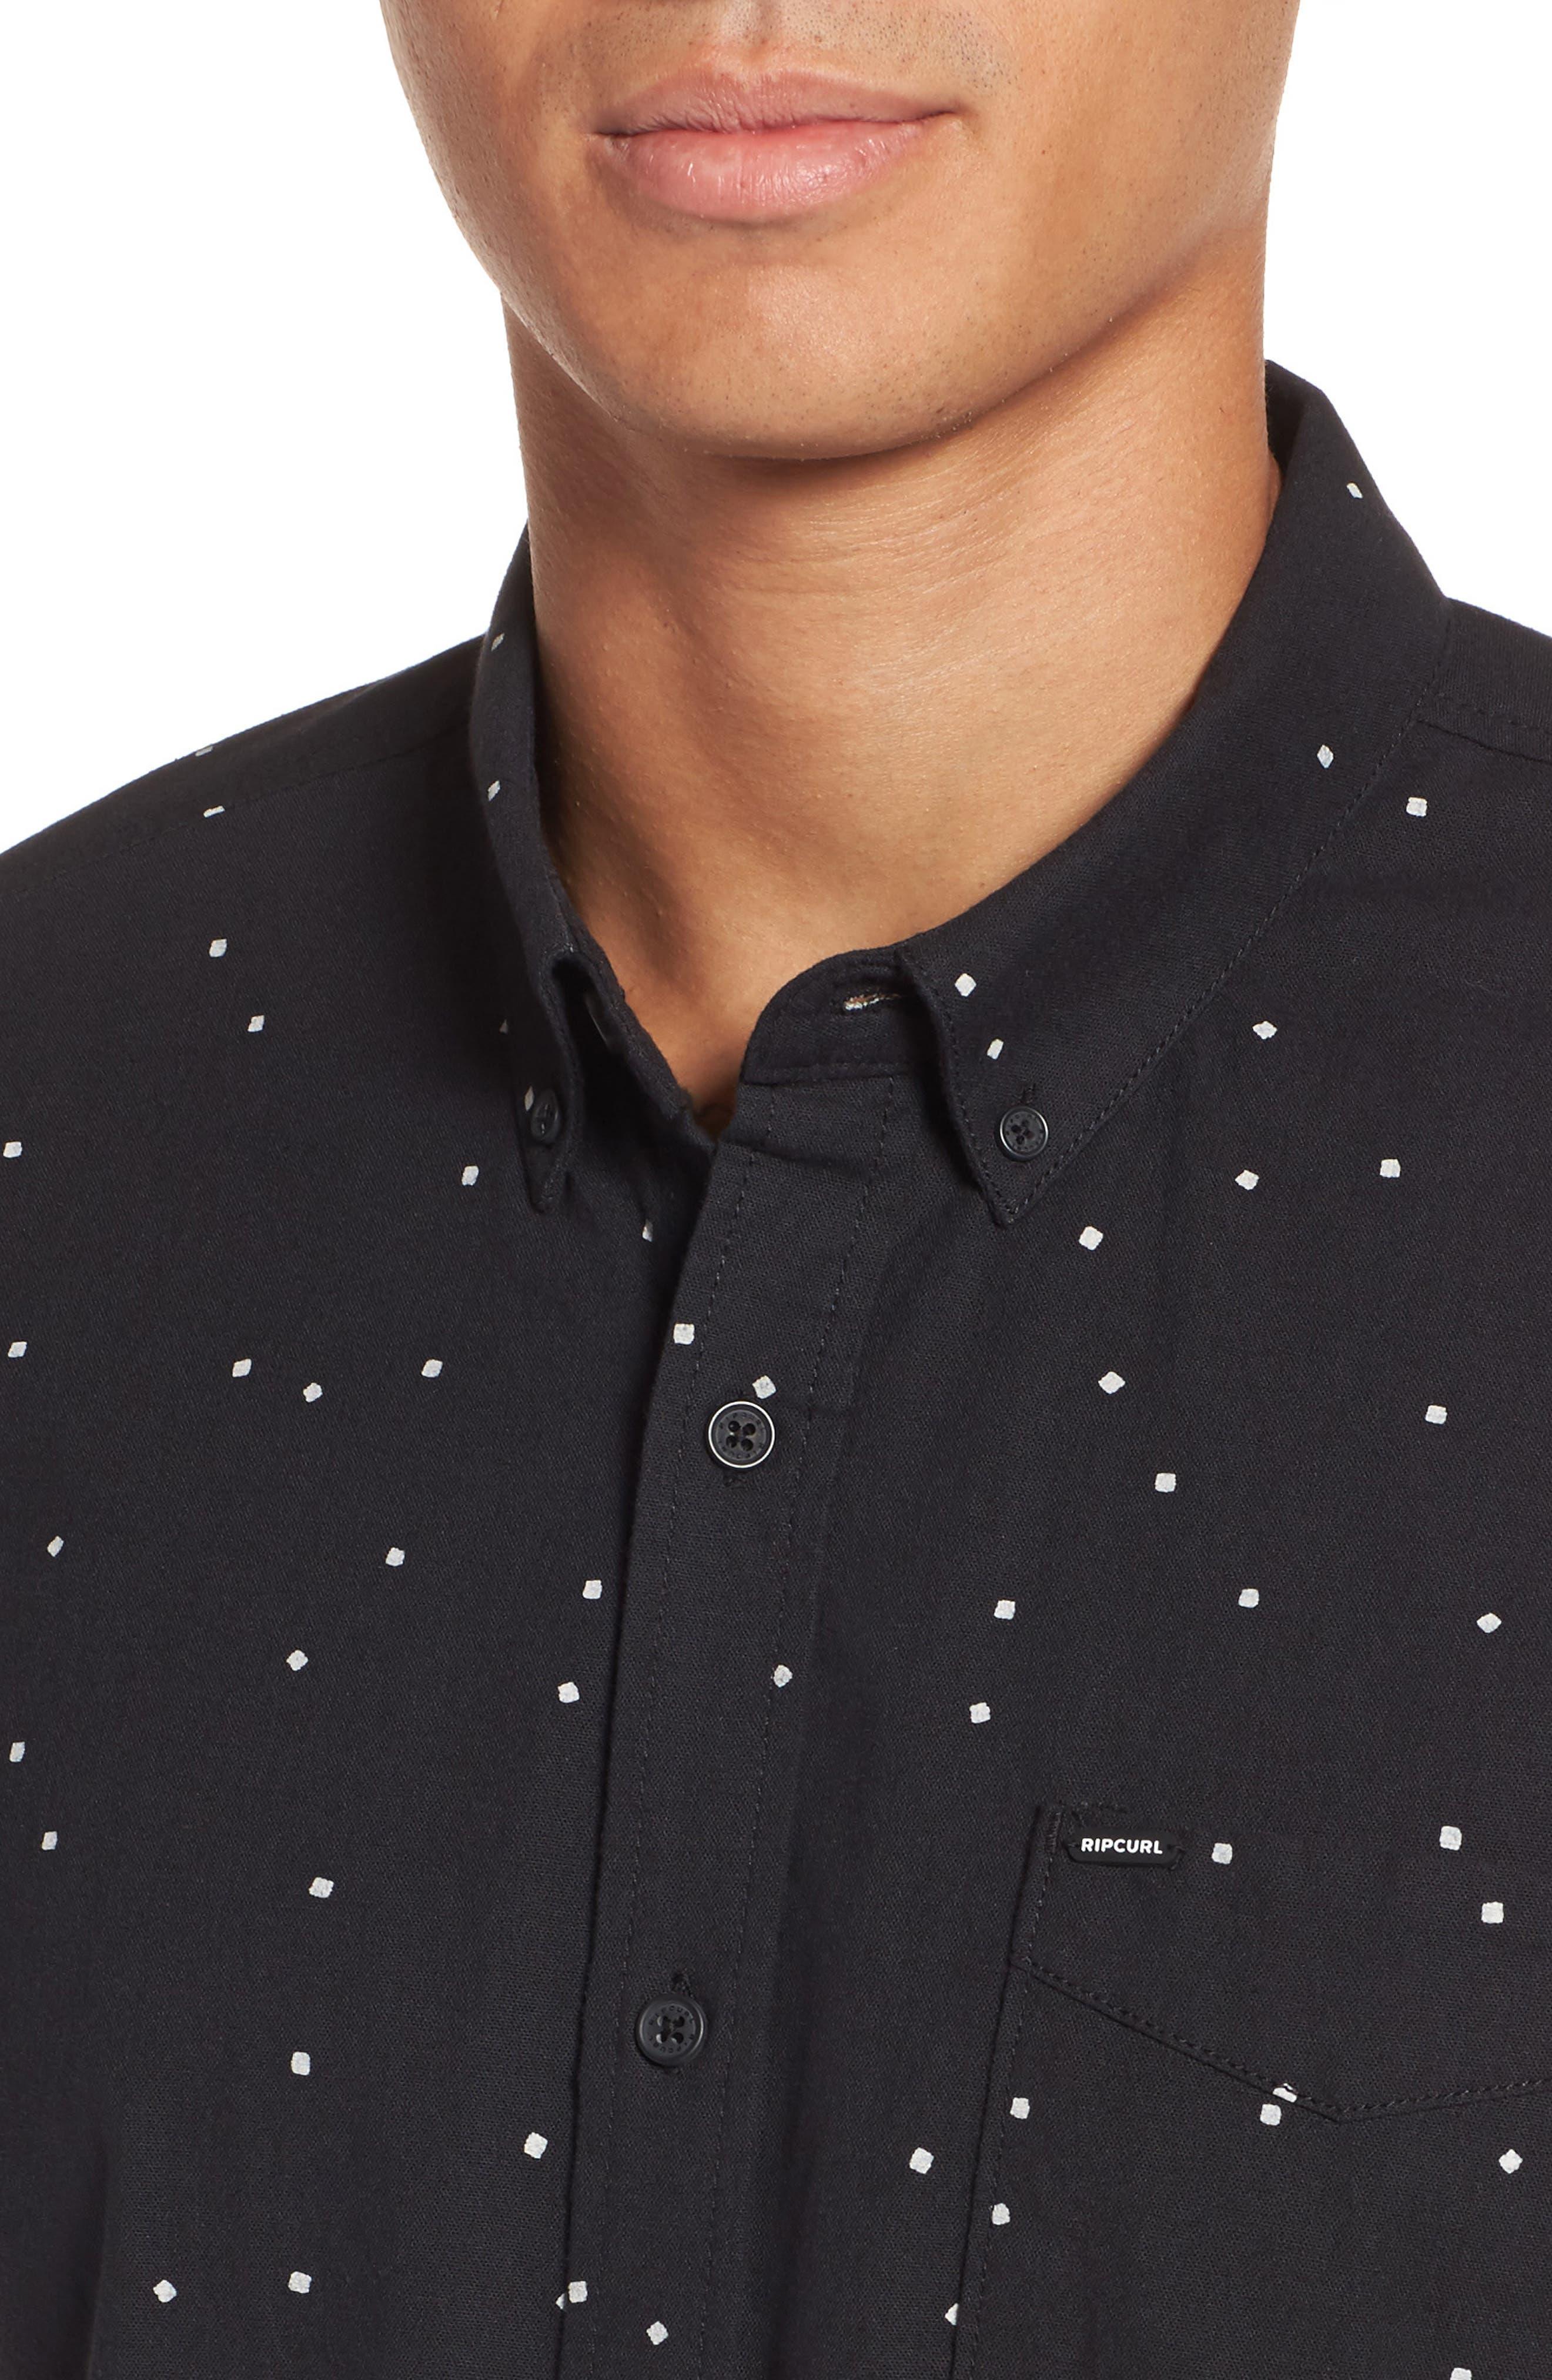 Mixter Short Sleeve Shirt,                             Alternate thumbnail 4, color,                             001